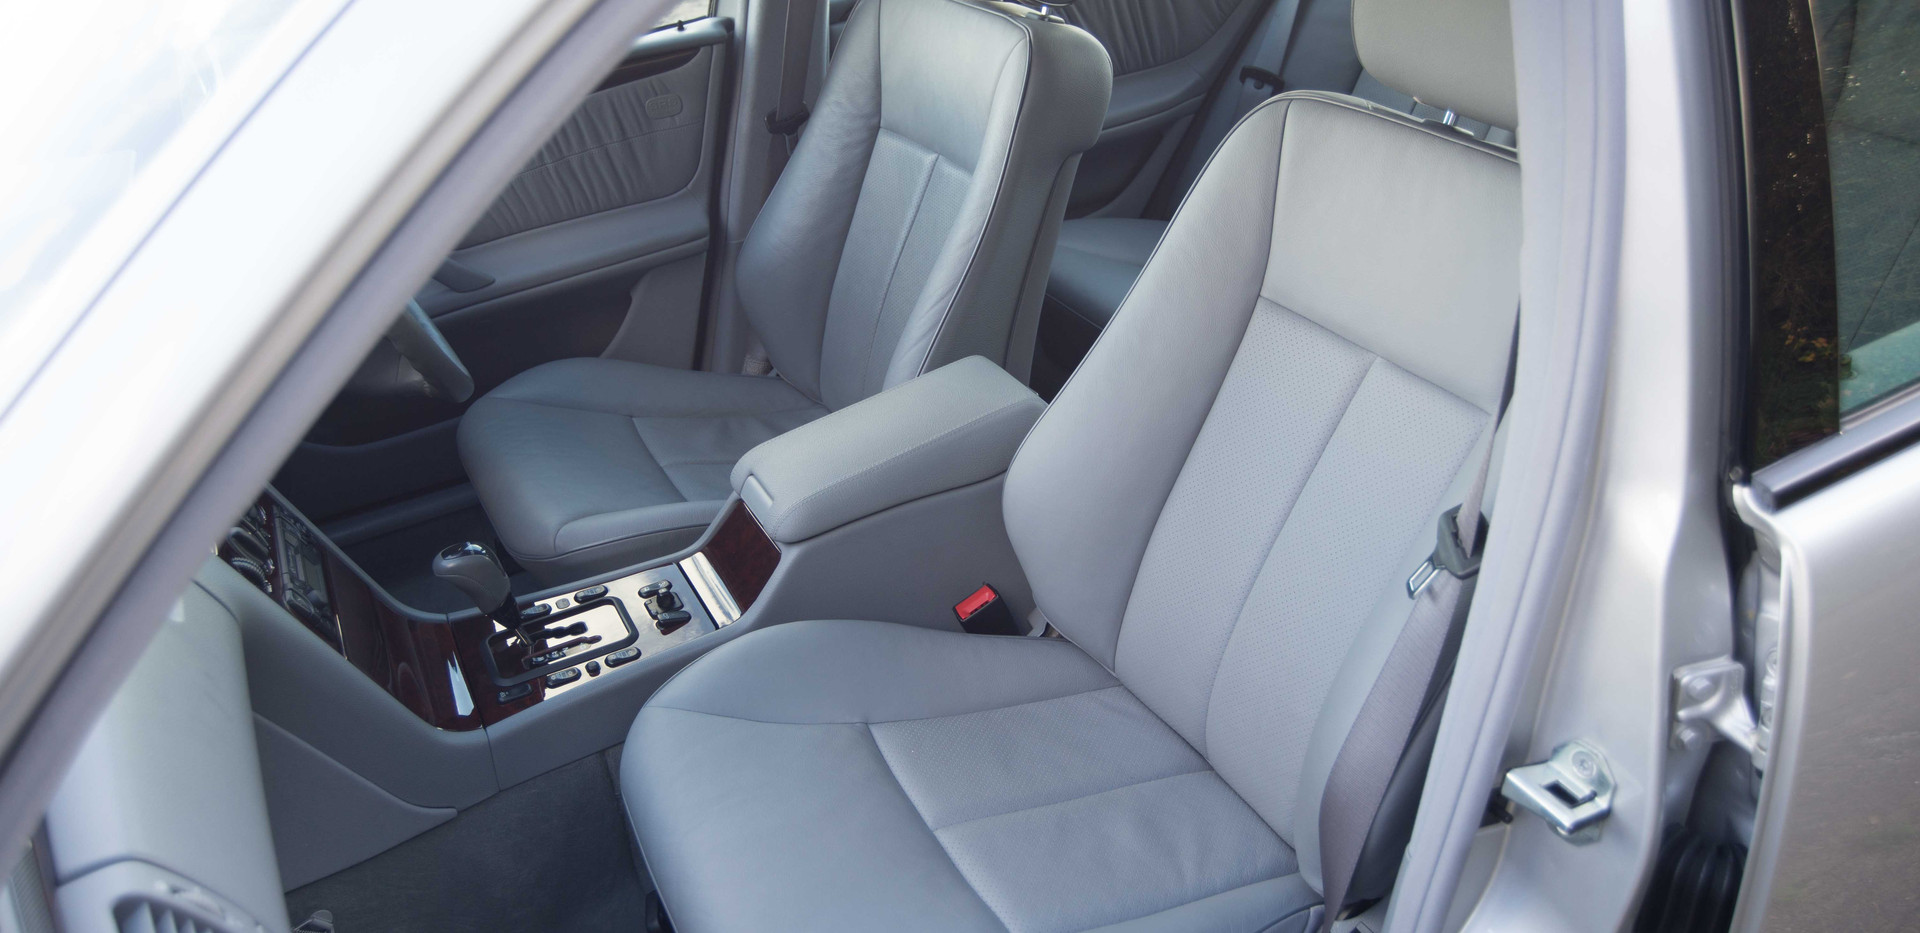 Mercedes E240 For Sale UK London  (65 of